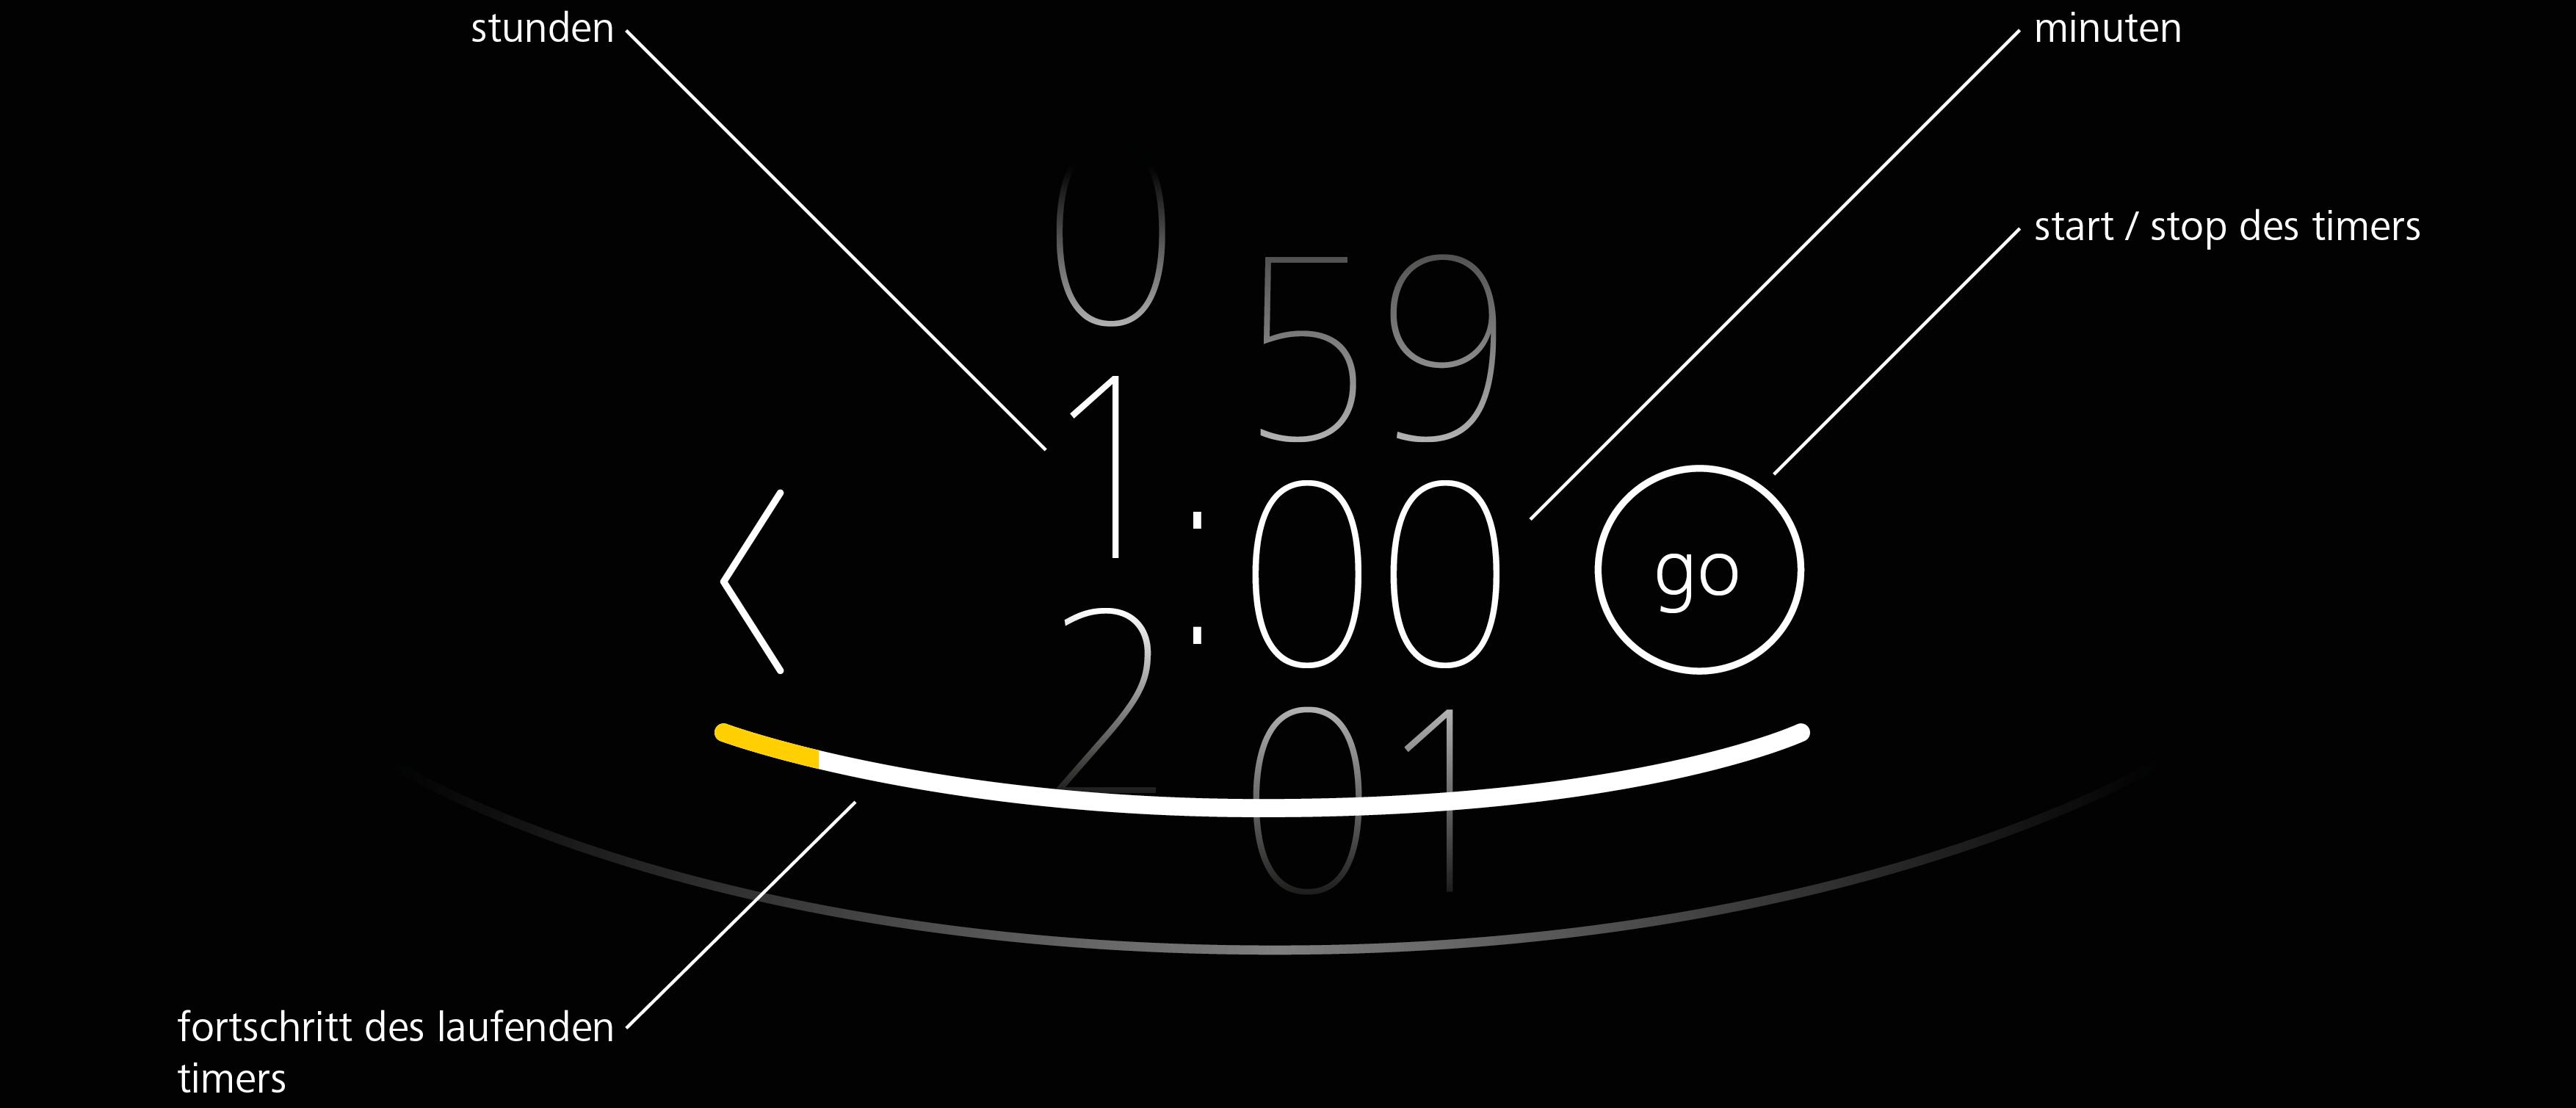 christian reimold heat interface timer